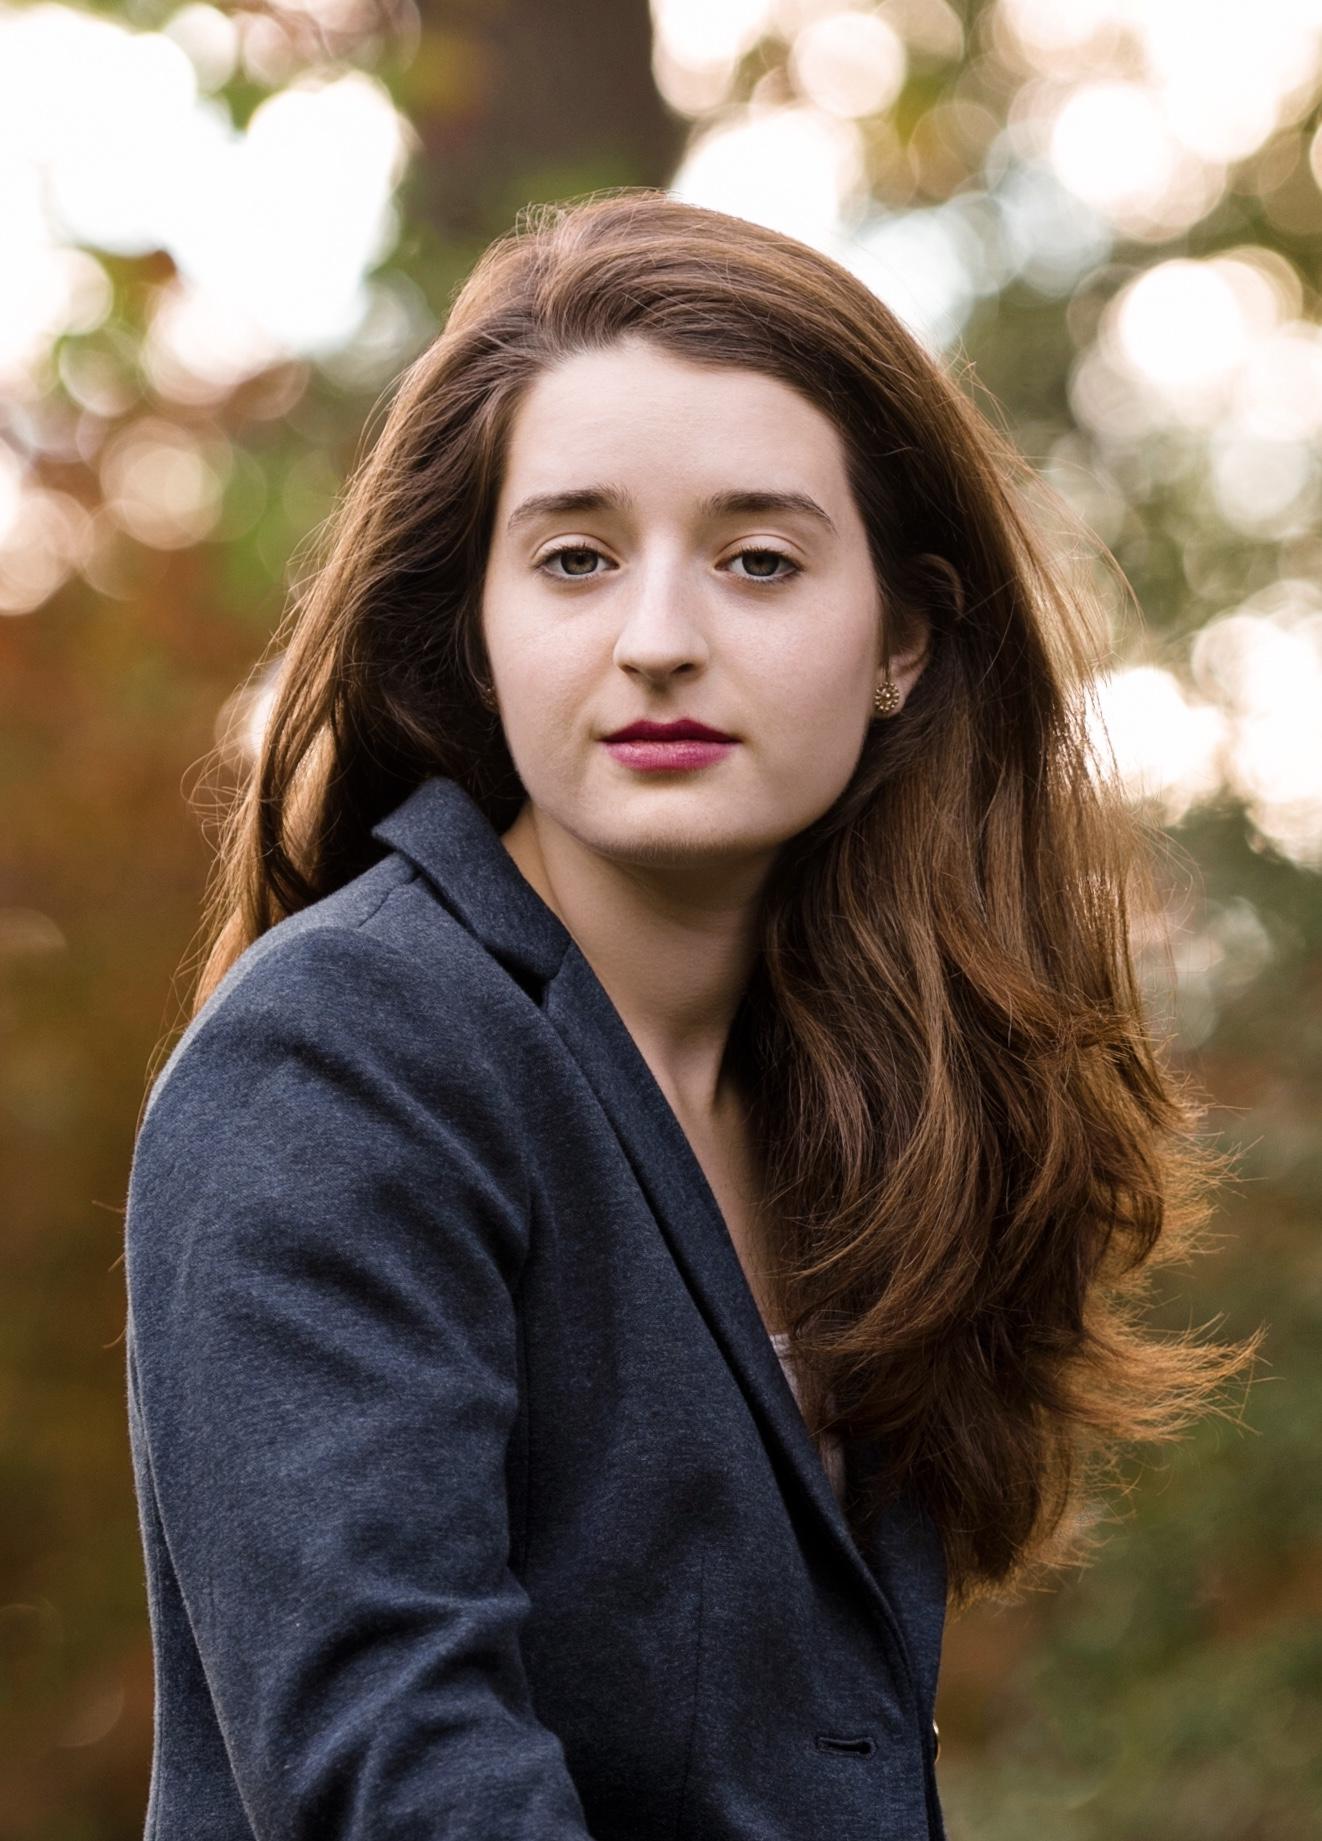 Elizabeth Hurley - Assistant Crisis Director